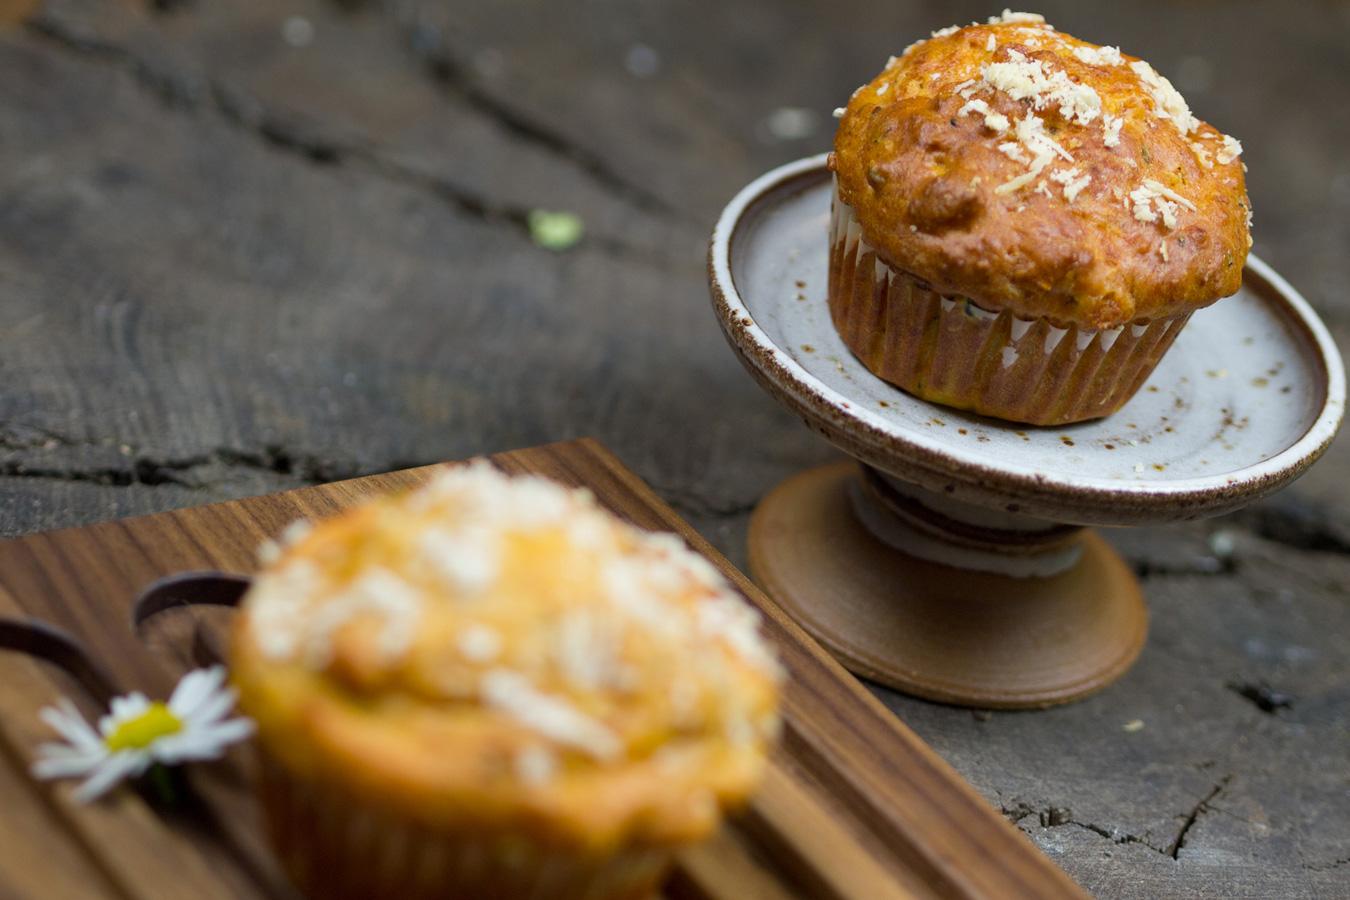 Brot & Co.: gemüsige Muffins